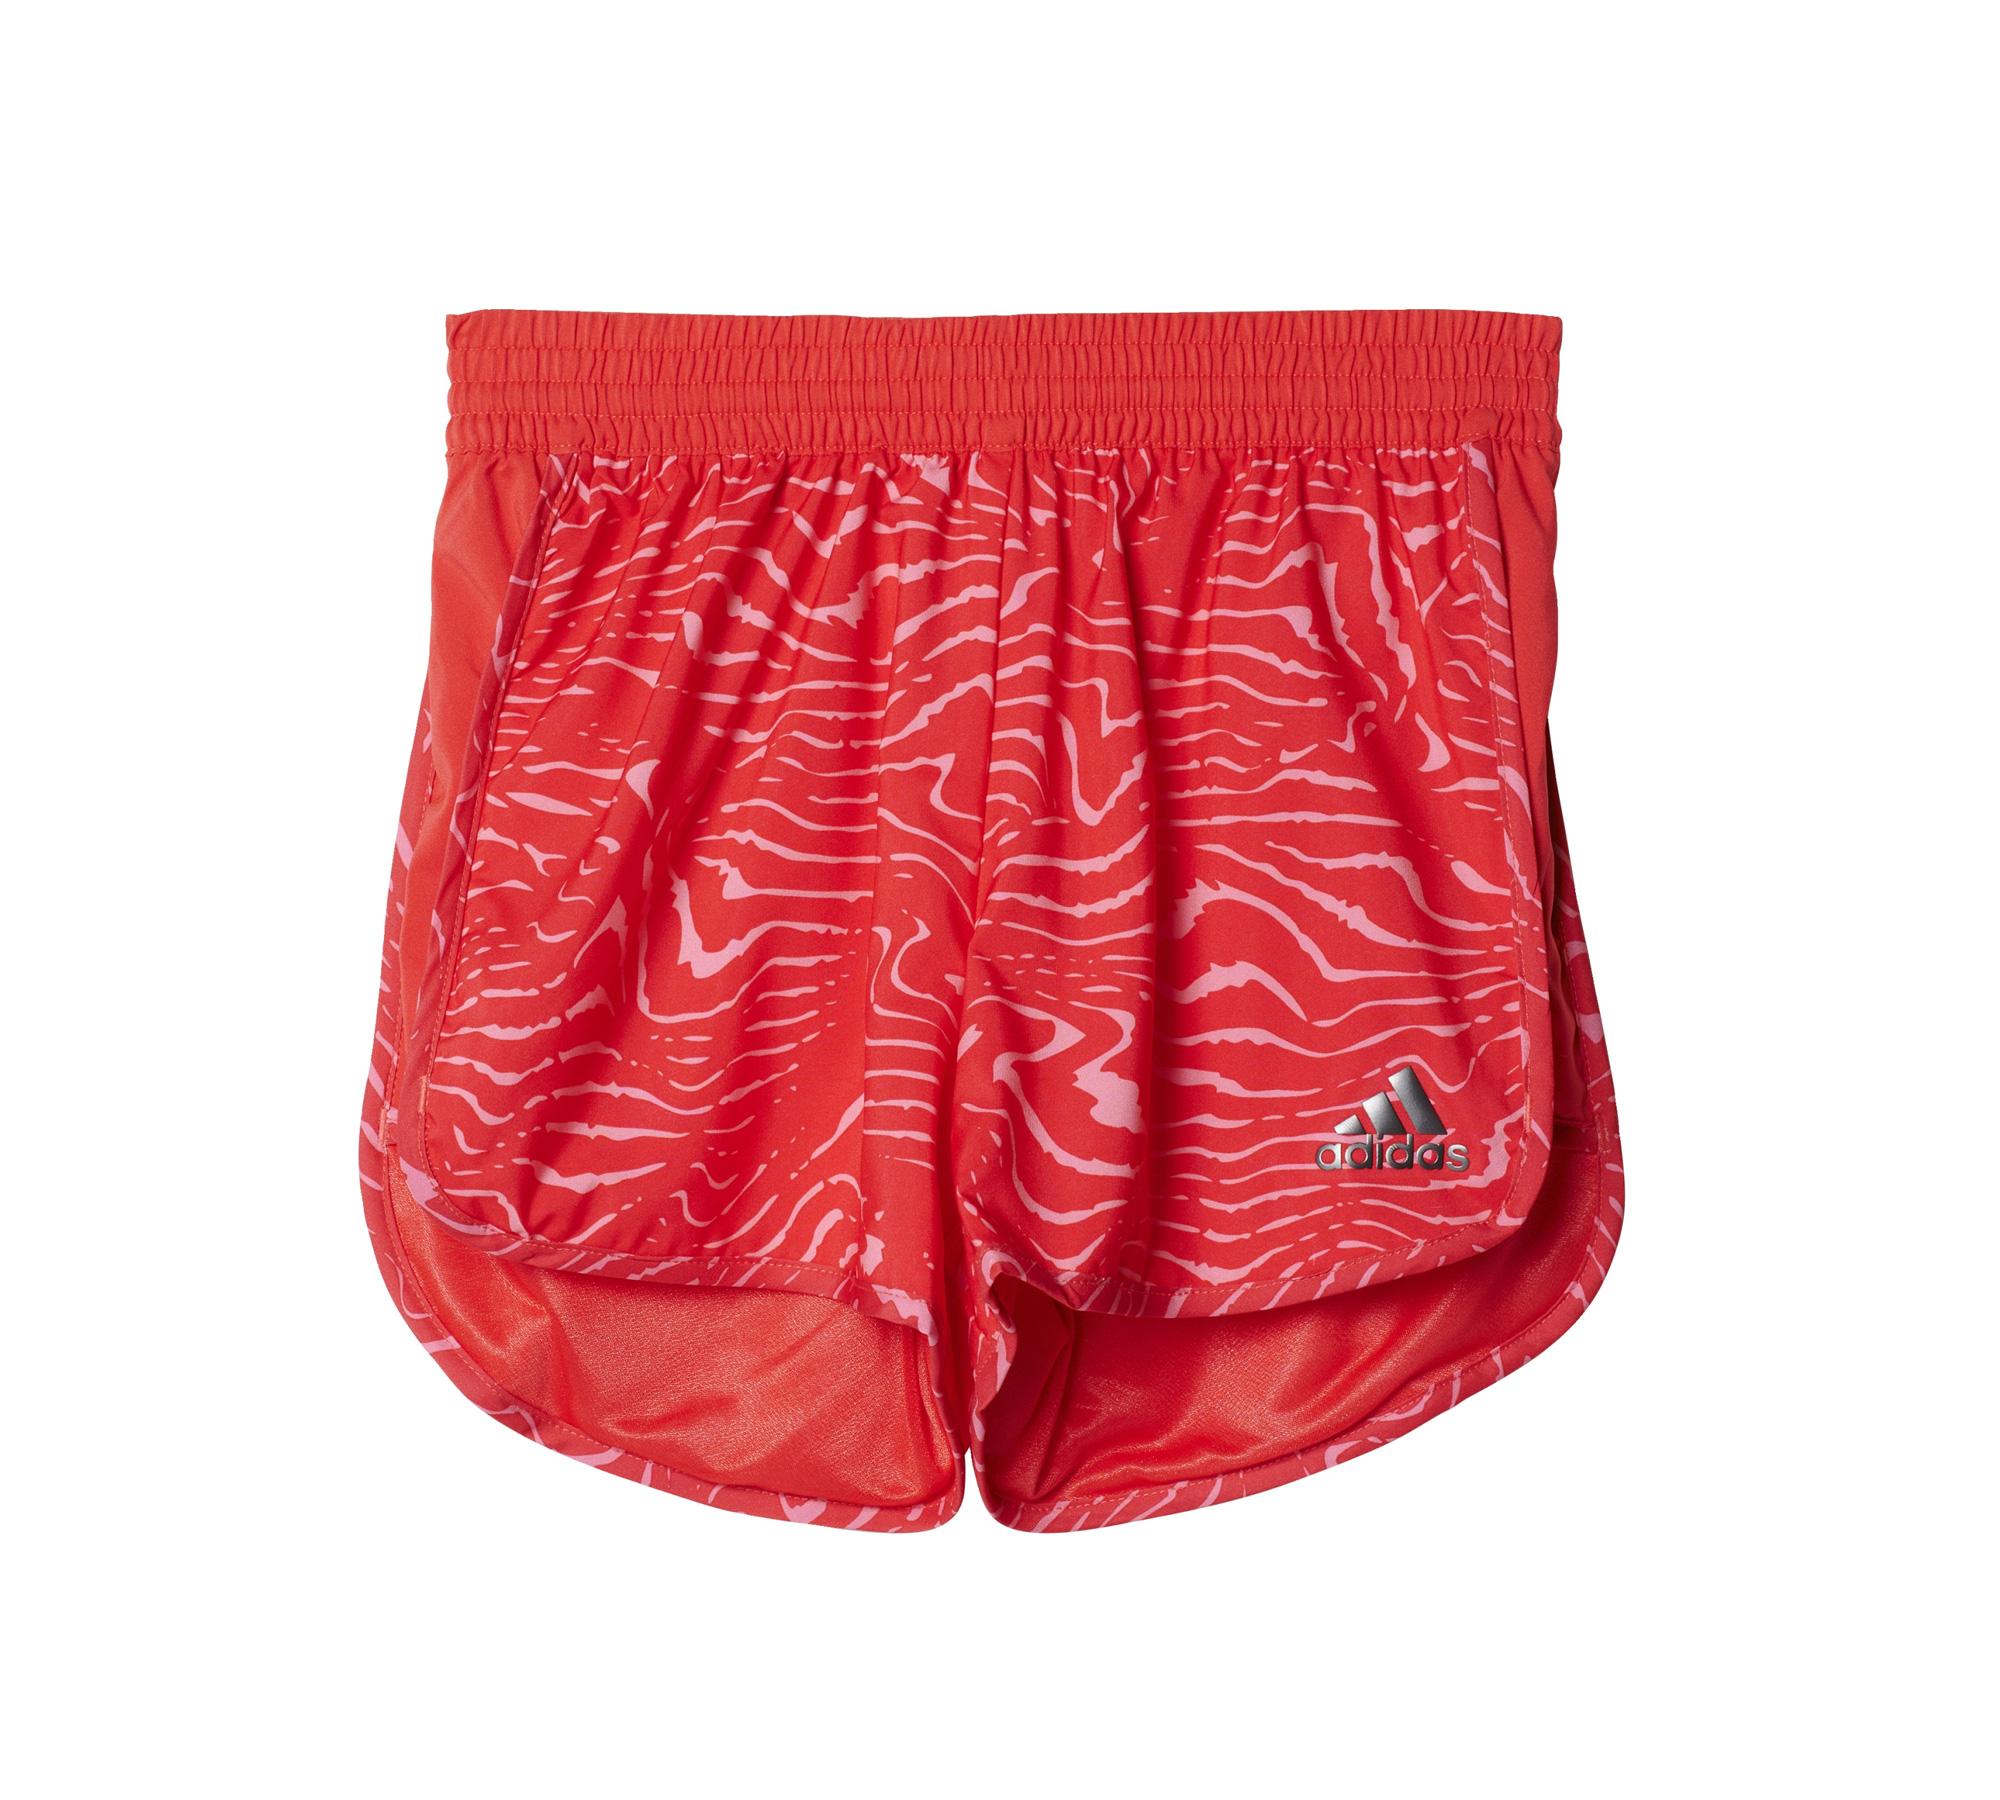 Adidas Spodenki Training Marathon Short rozowe r. 128 cm (BK3859) BK3859